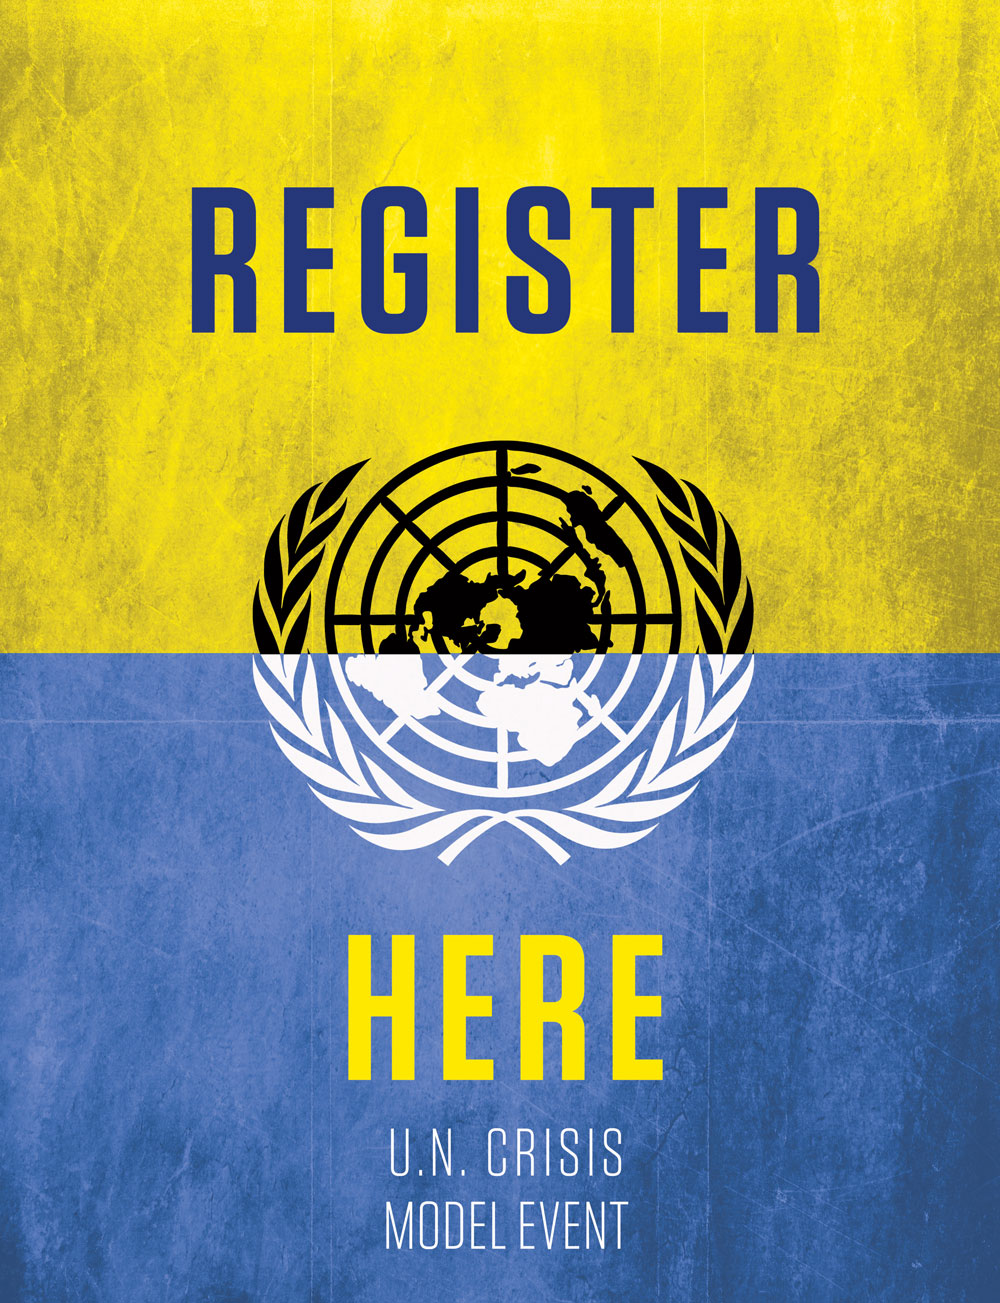 UN Crisis poster for UND